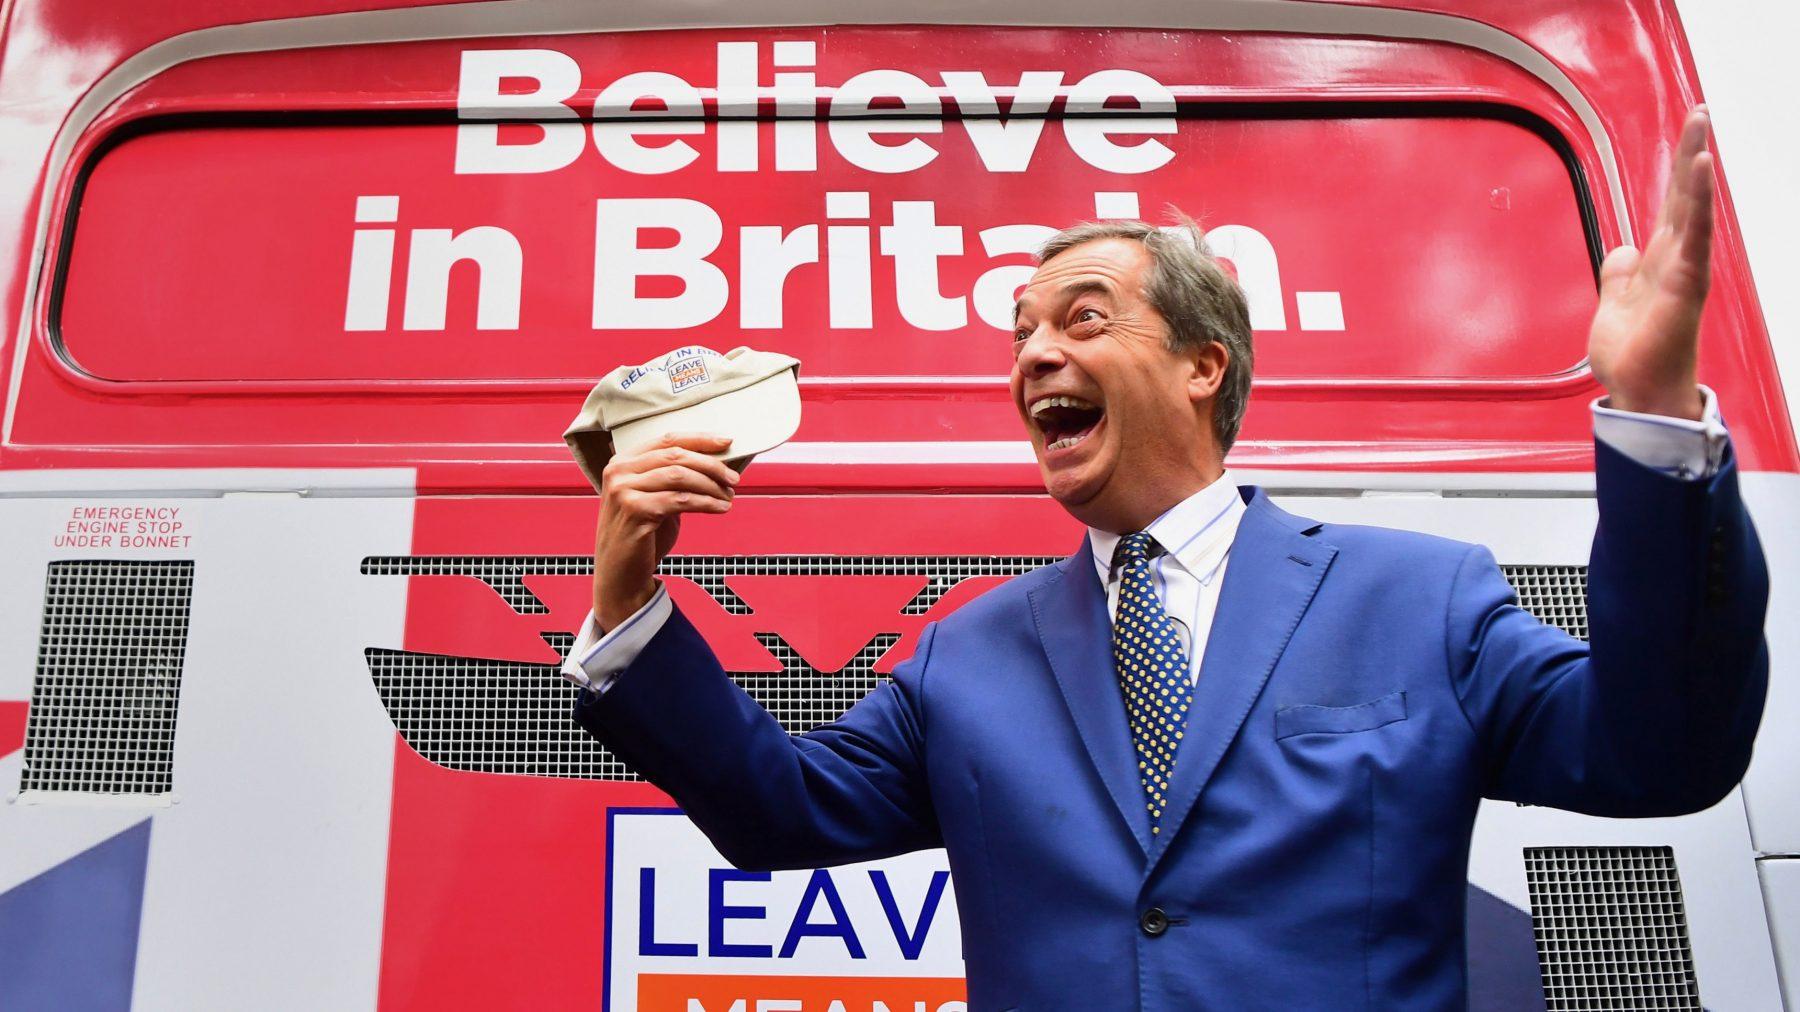 brexit-boegbeeld-nigel-farage-verlaat-politiek